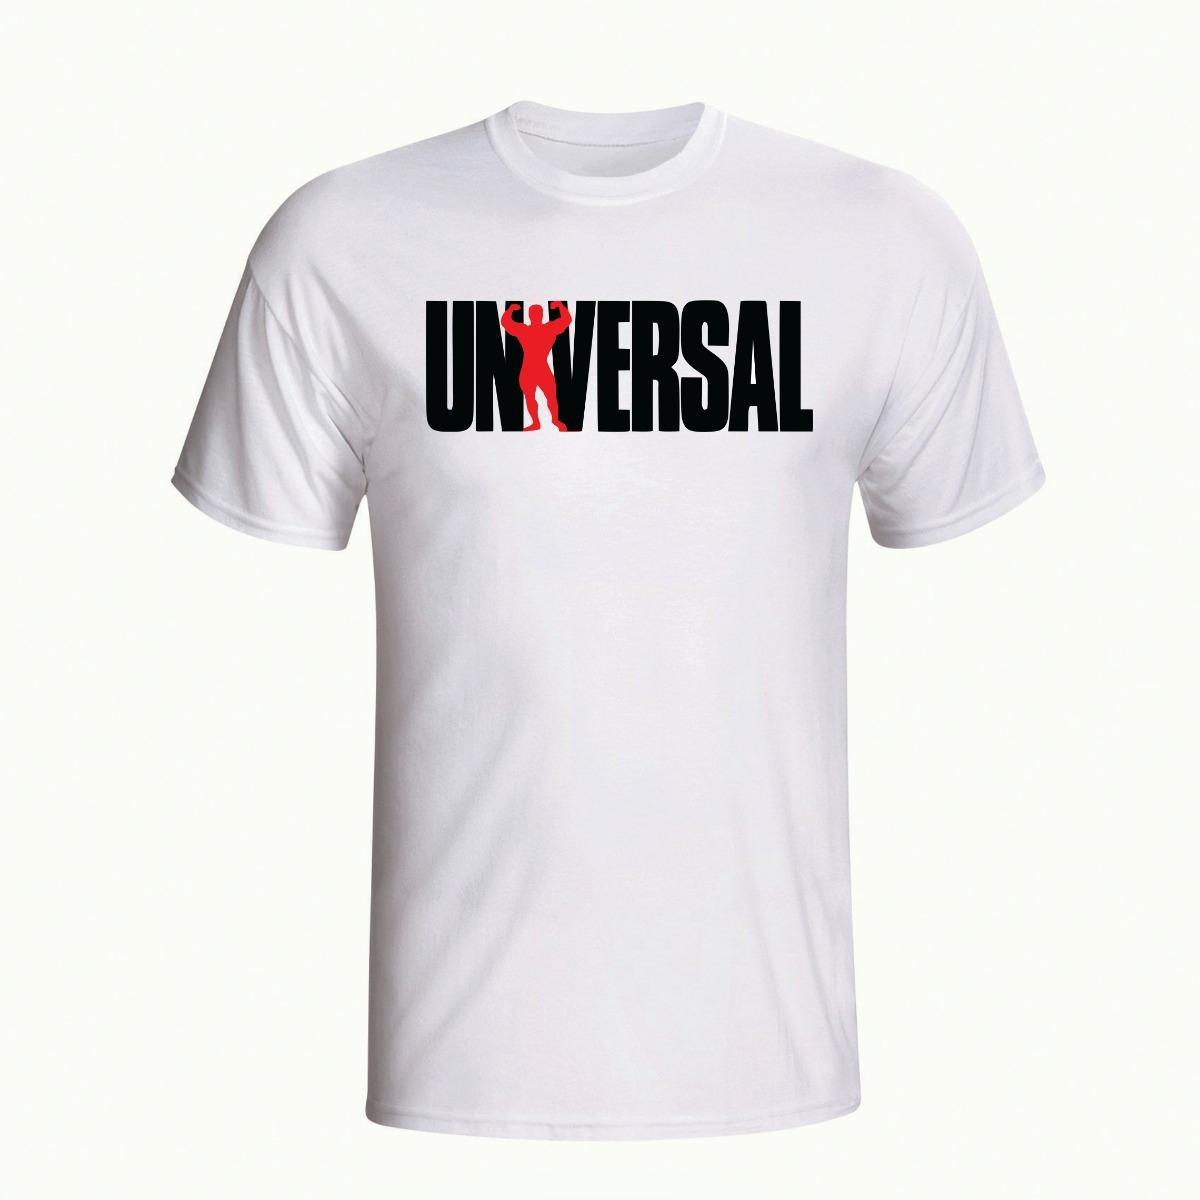 b22562e4b camisa camiseta personalizada universal academia branca. Carregando zoom.